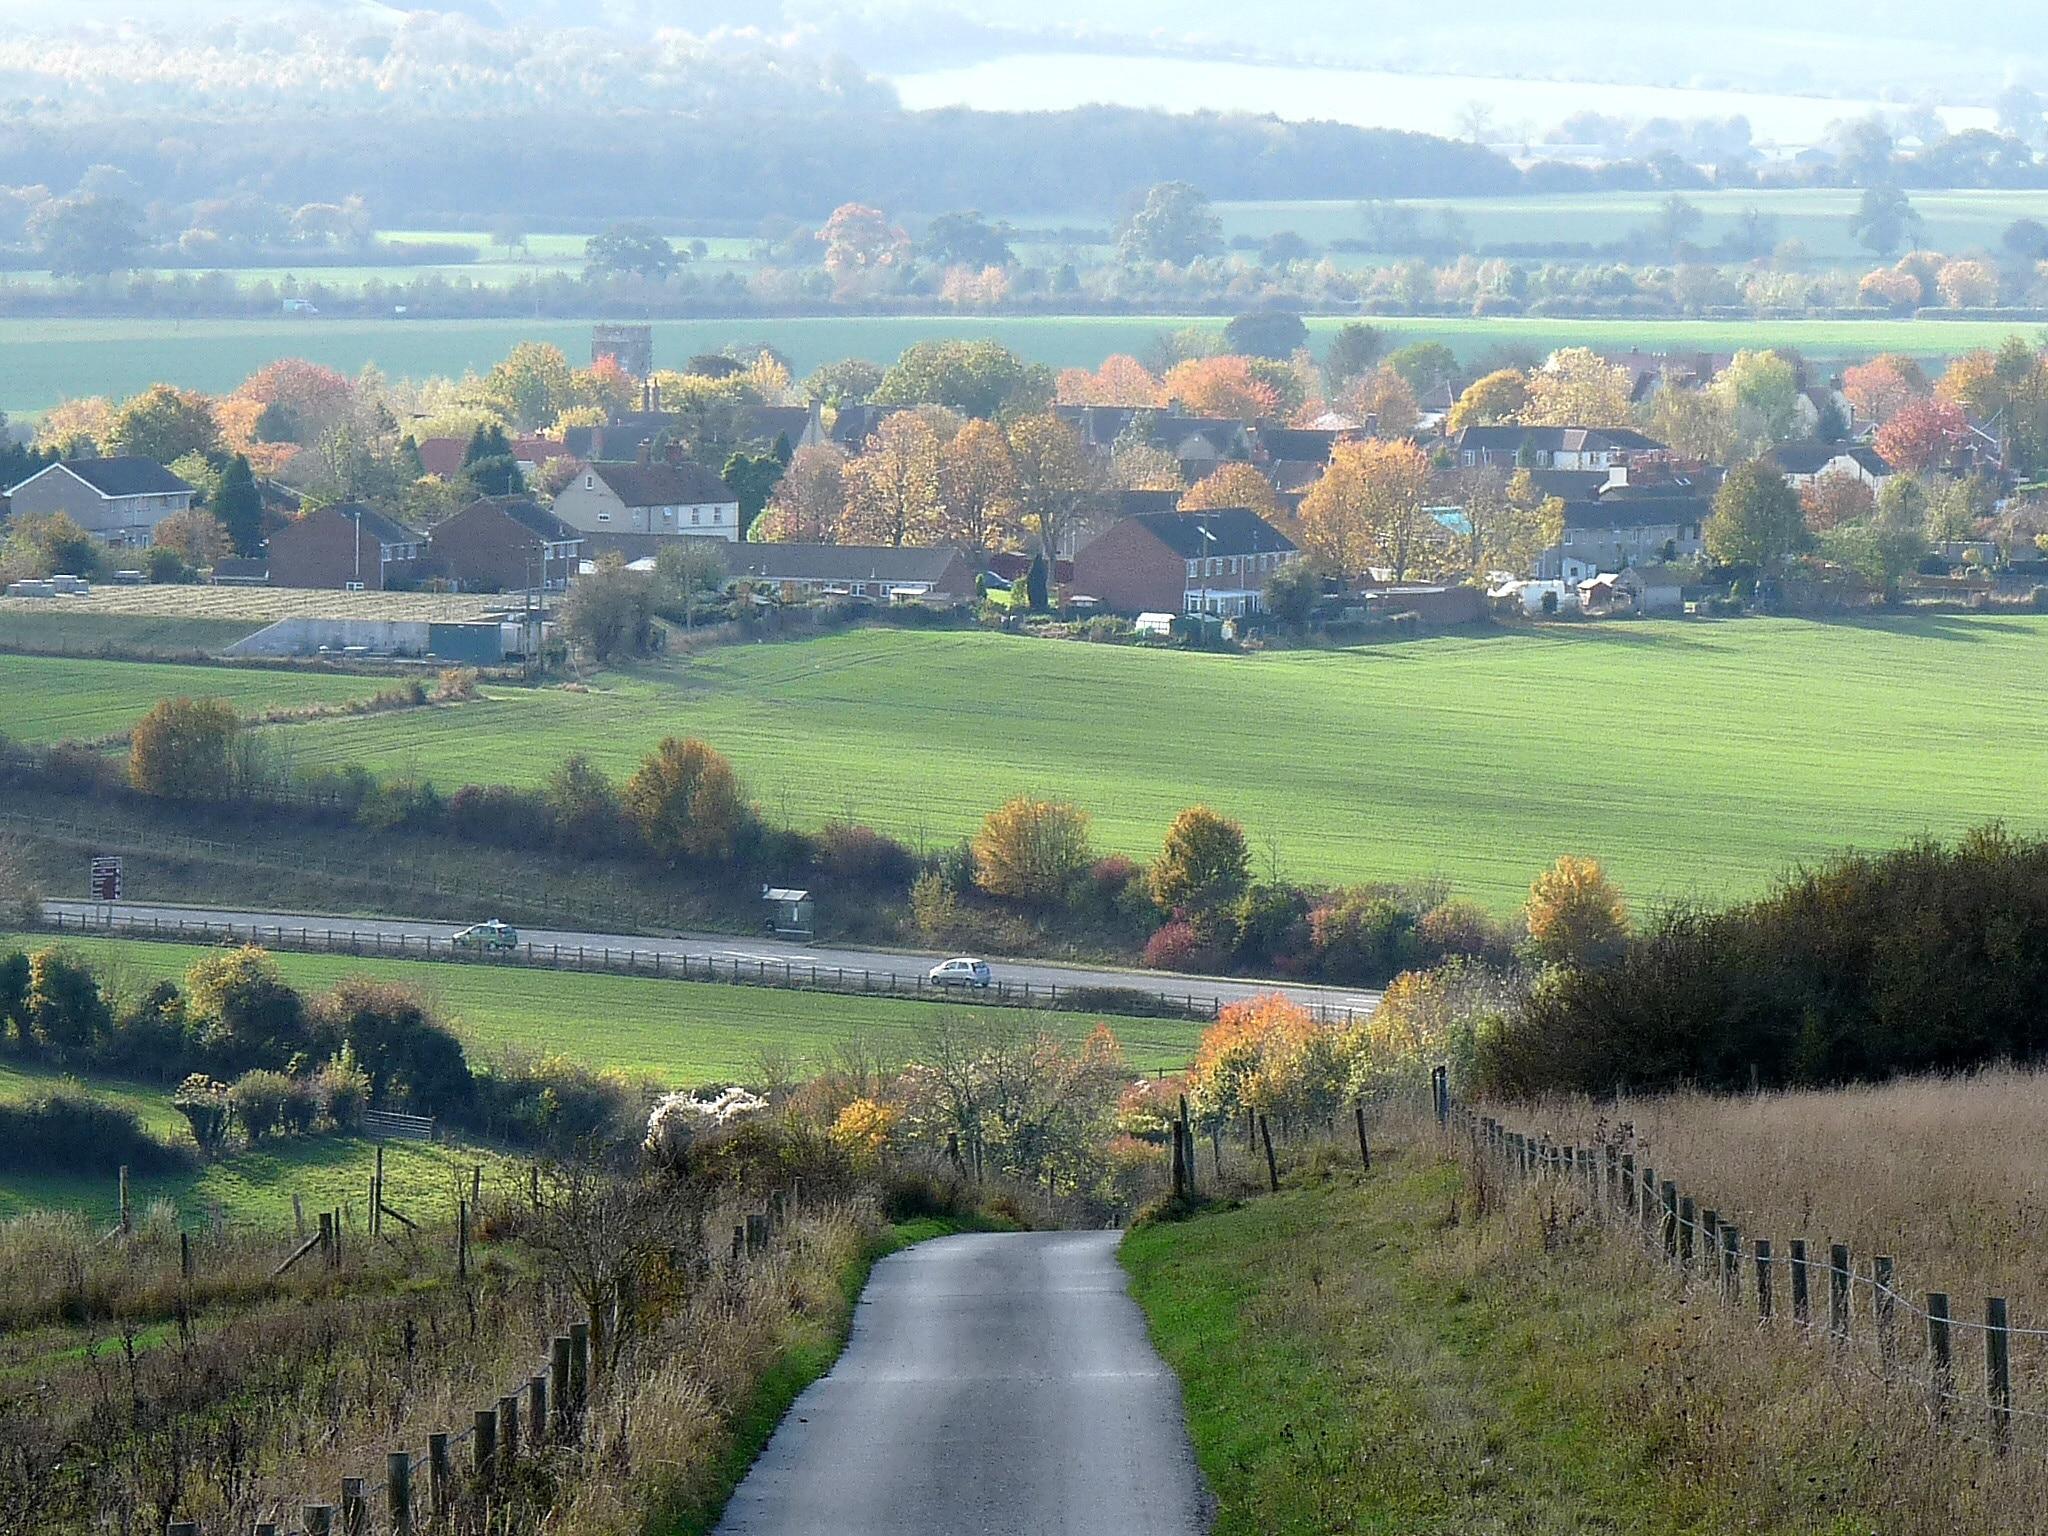 Upton Scudamore, Warminster, Engeland, Verenigd Koninkrijk